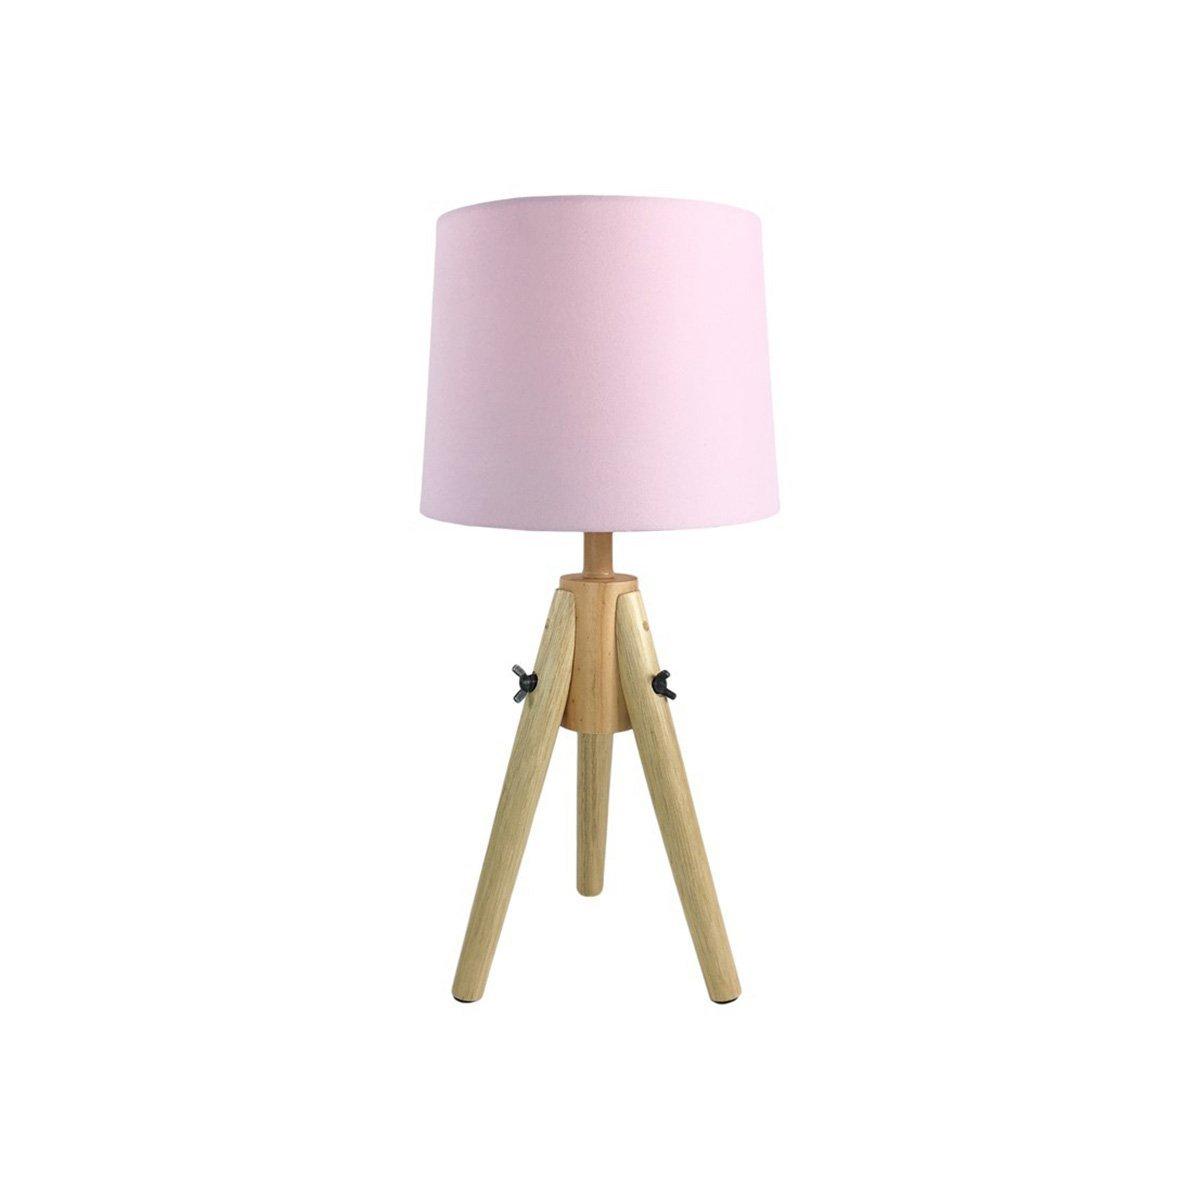 Lámpara de mesa escandinava en madera rosa: Amazon.es: Hogar